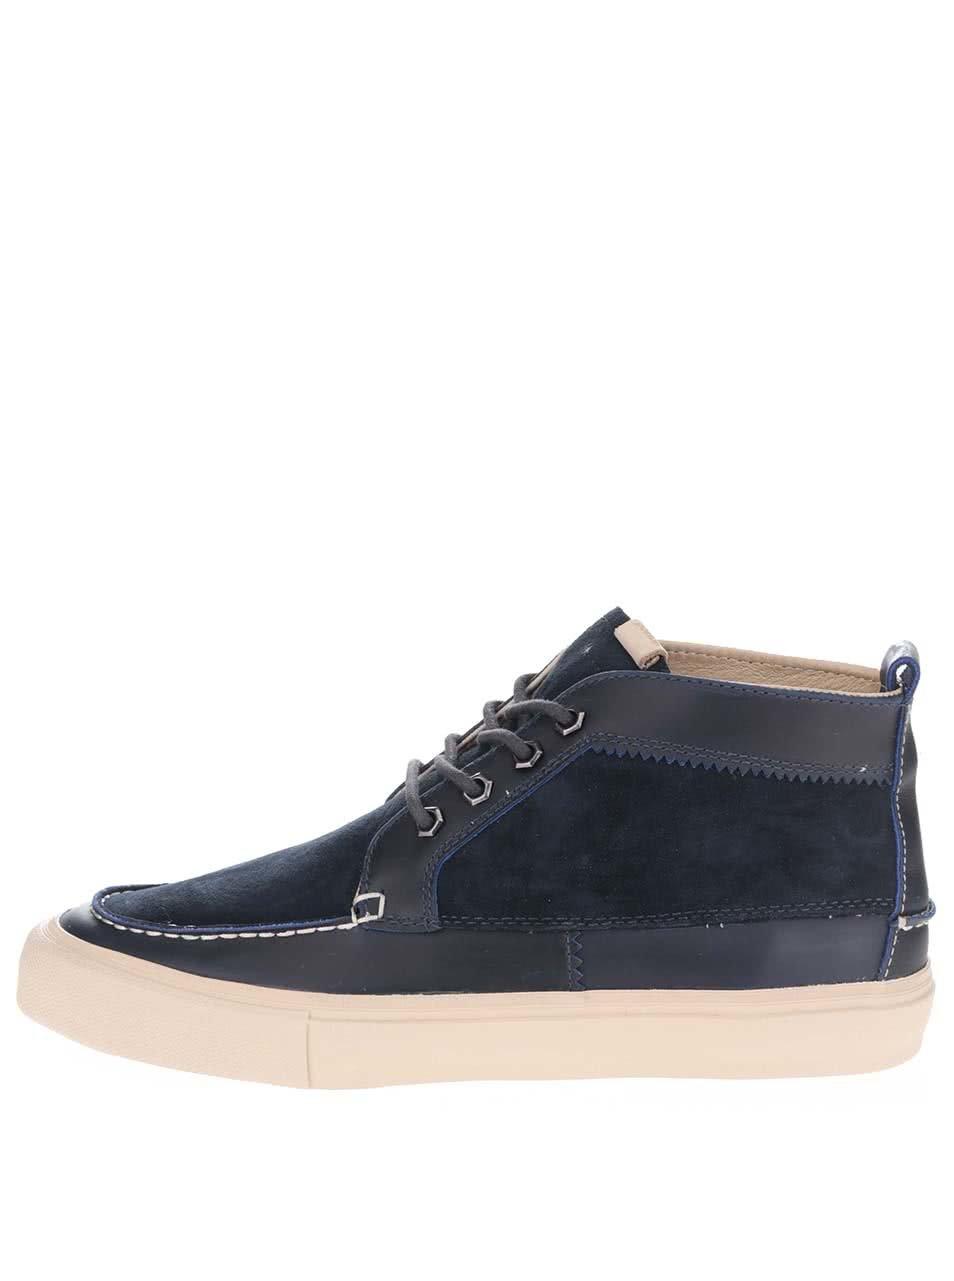 b9a4d80beda55 Tmavomodré pánske semišové členkové topánky Pointer Roger | ZOOT.sk